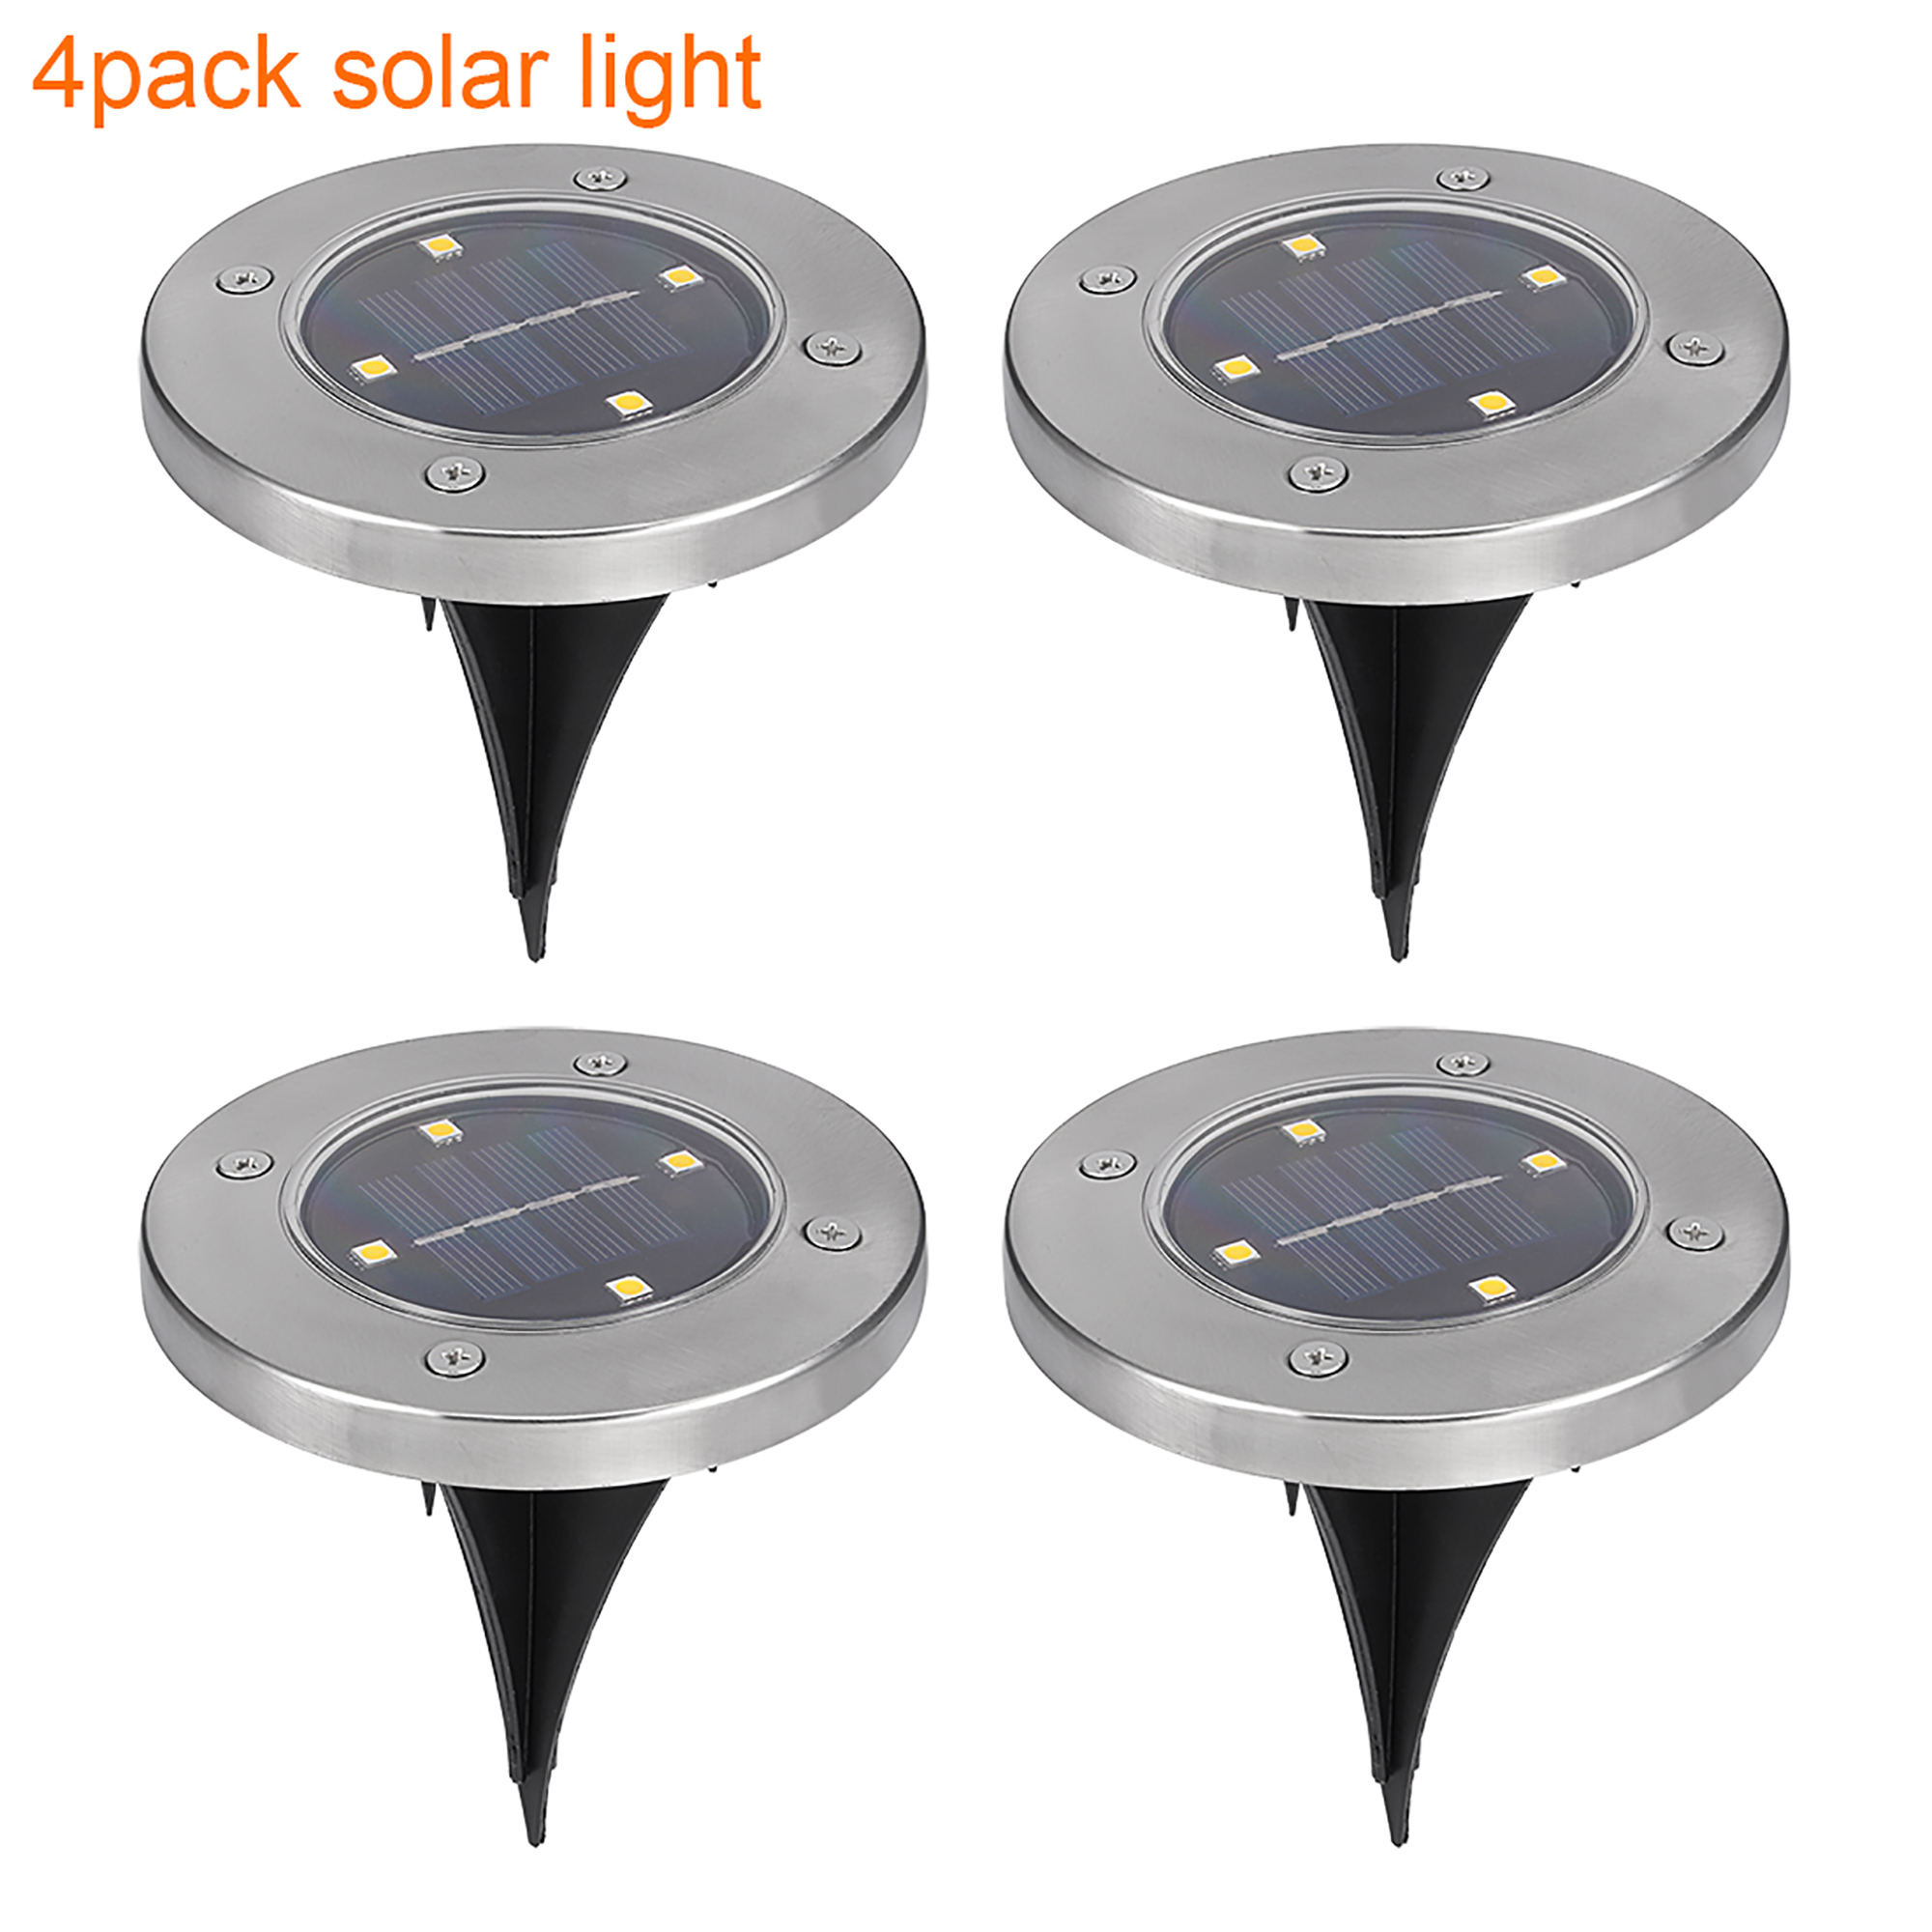 Solar Ground Lights 4 LED Garden Landscape Pathway Light Warm White 4 Pack